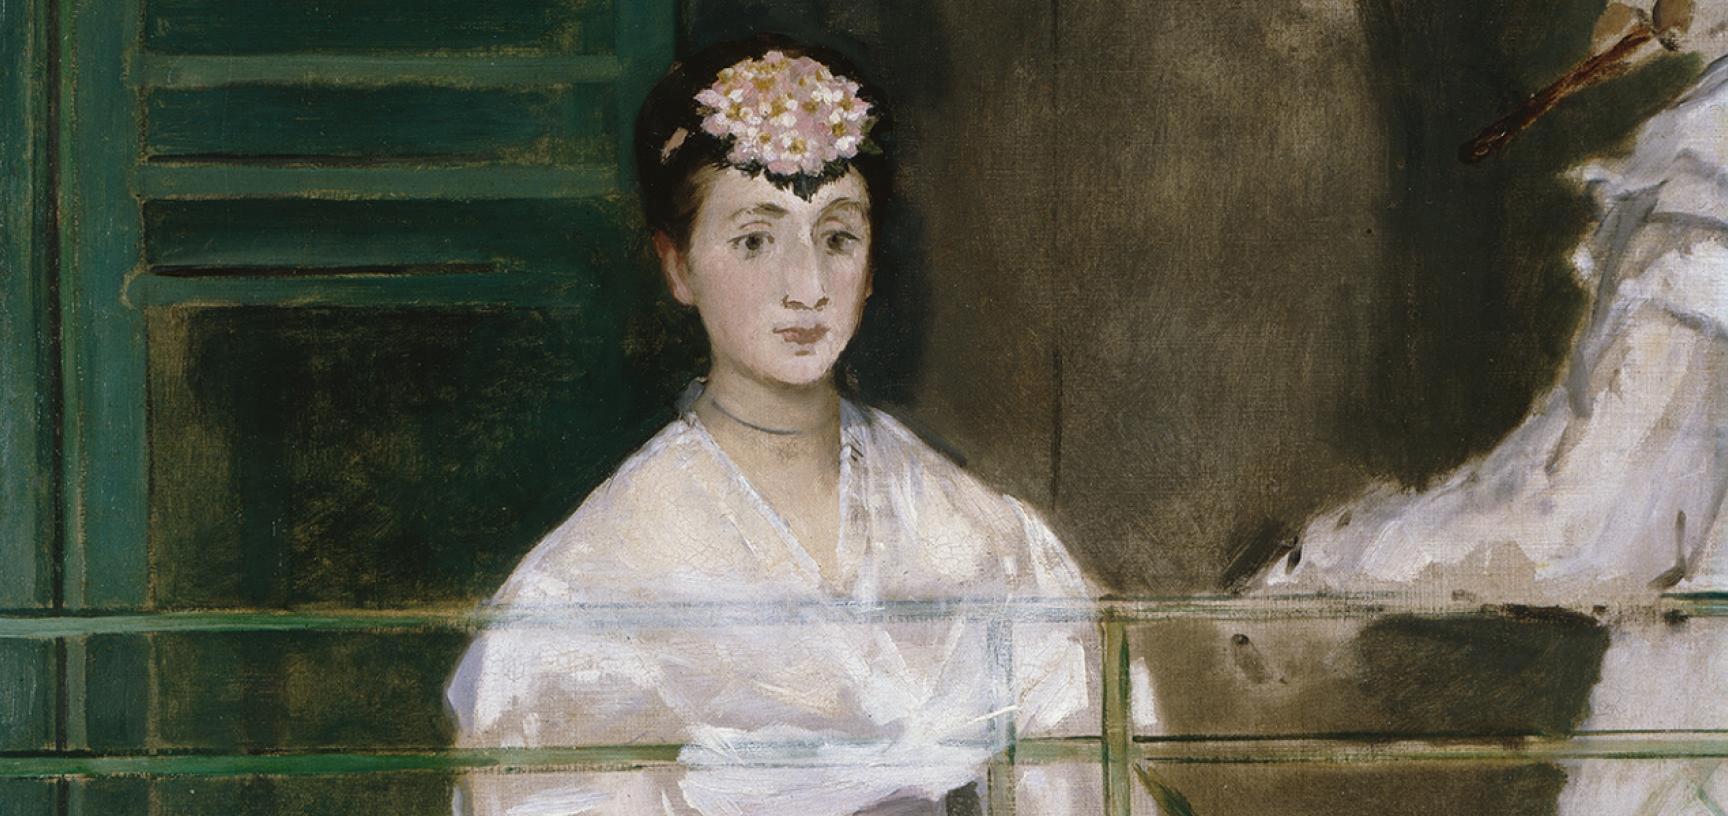 PORTRAIT OF MADEMOISELLE CLAUS by Édouard Manet